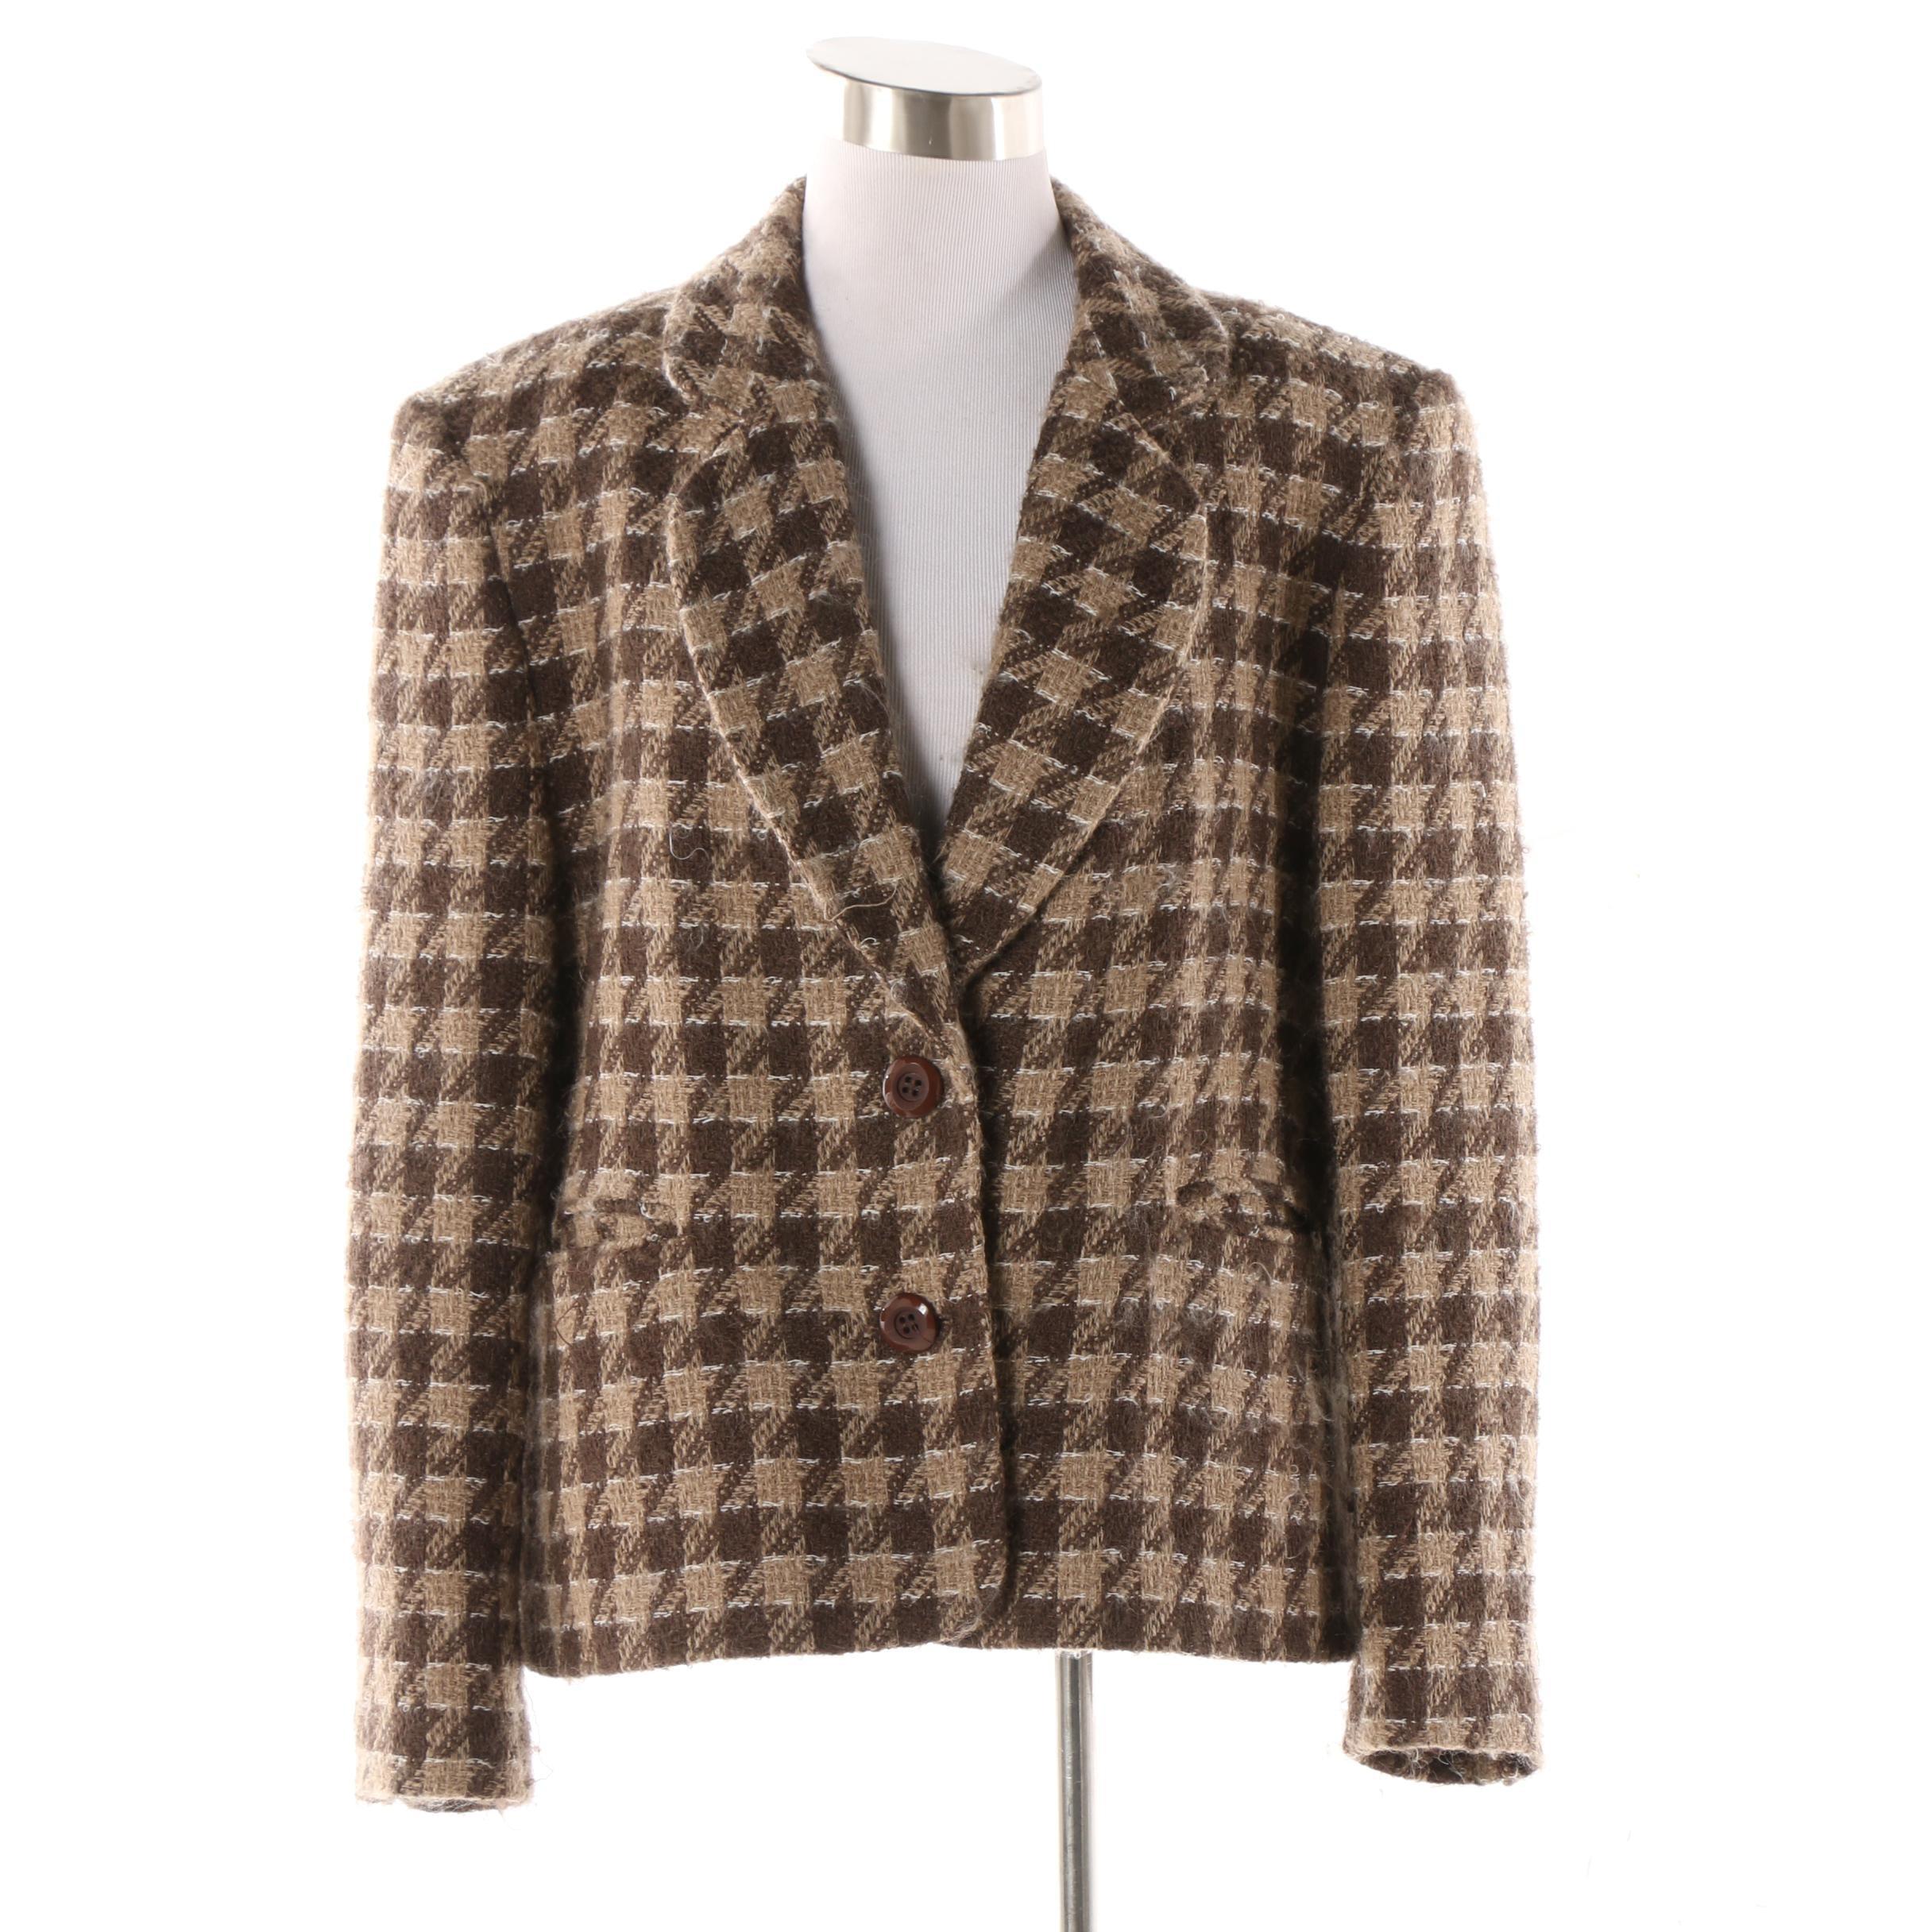 Women's Bleyle Wool and Mohair Blend Jacket